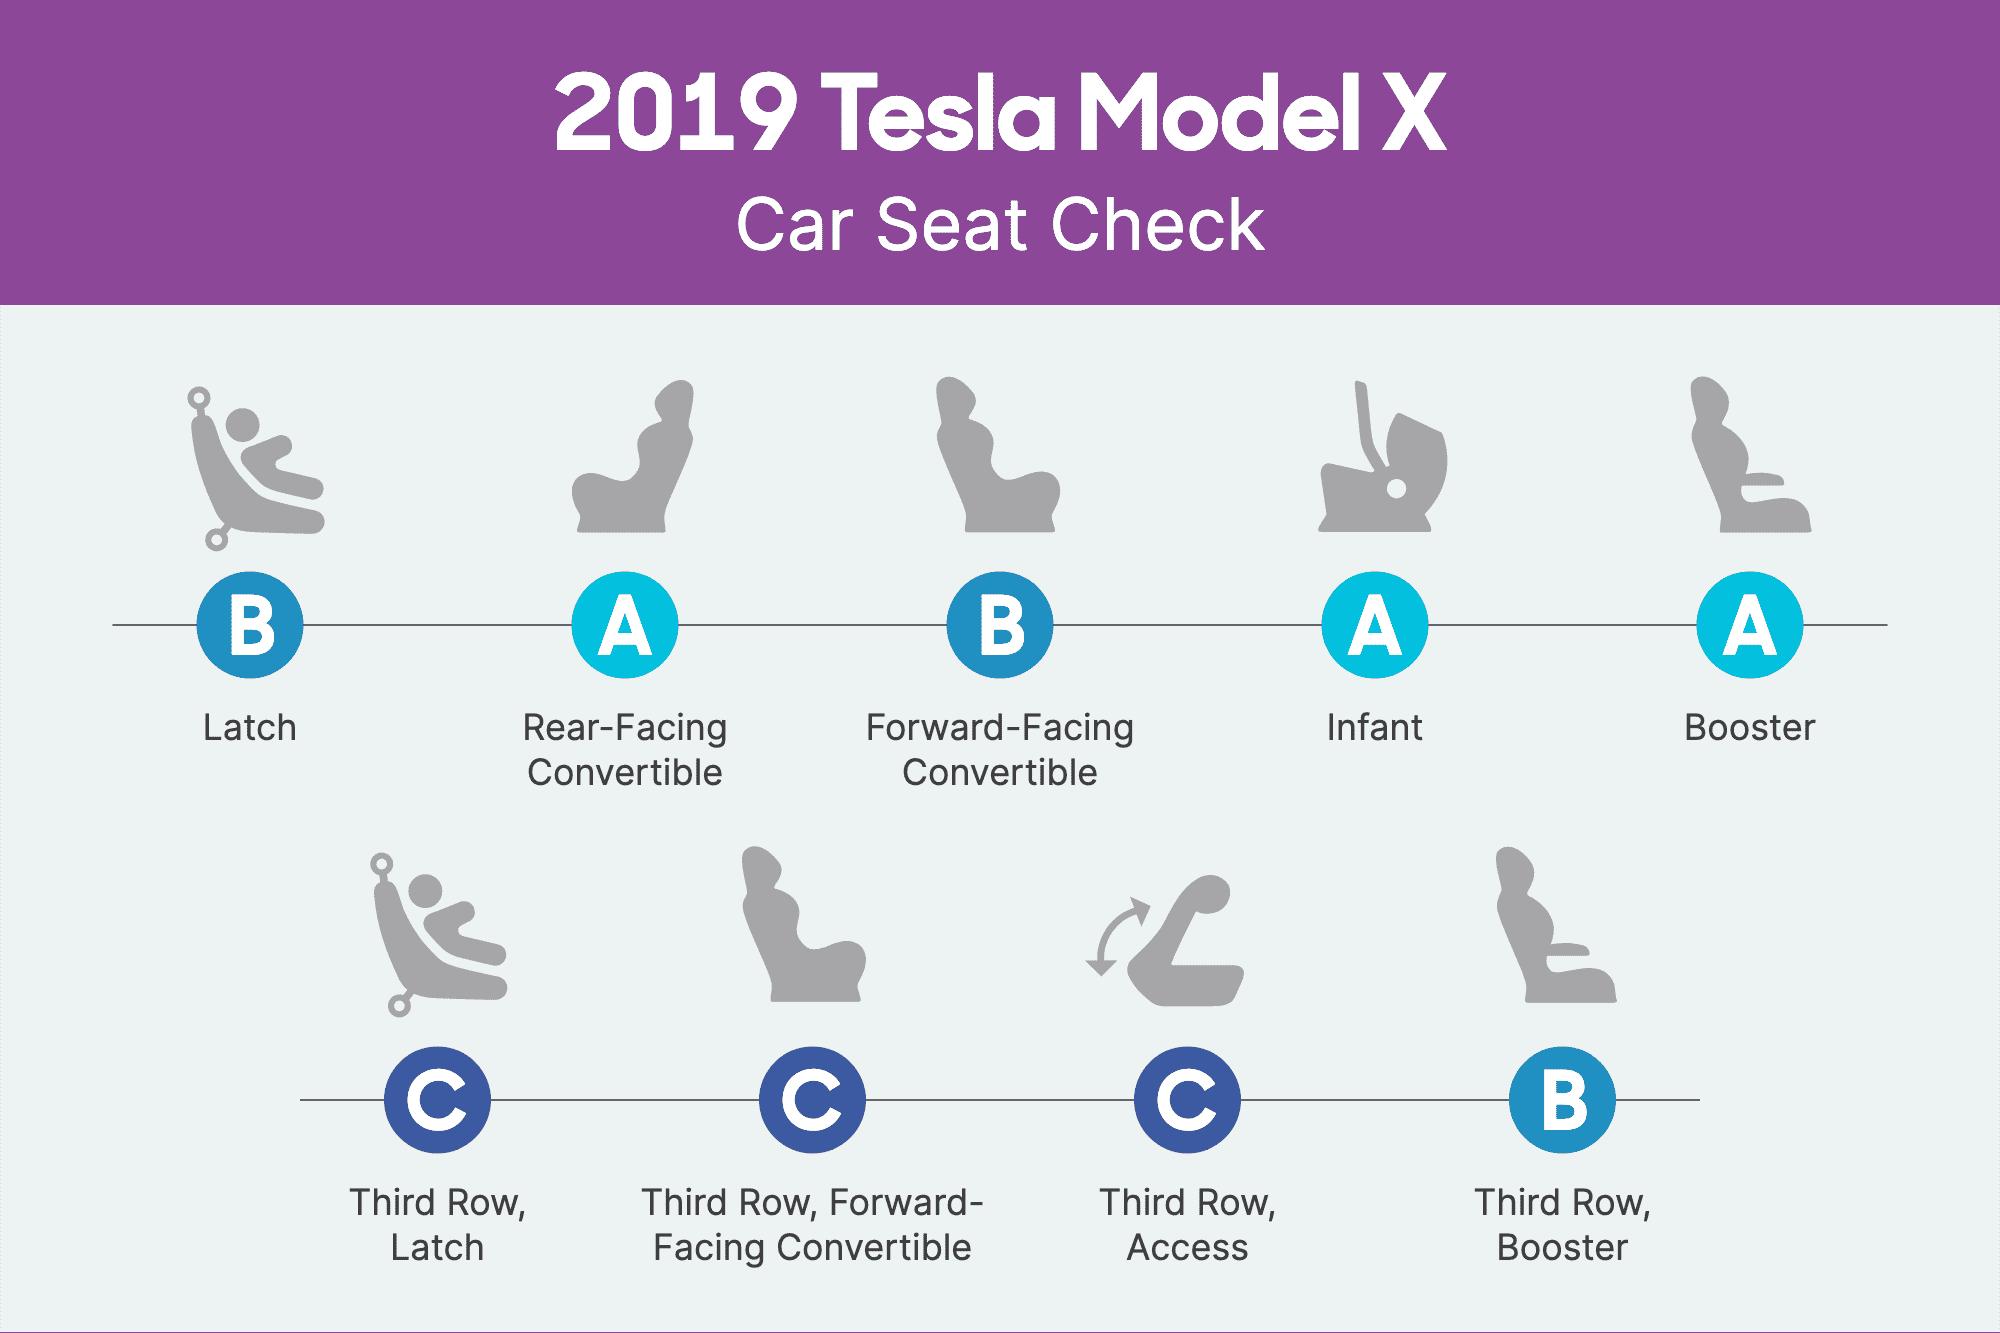 tesla-model-x-2019-csc-scorecard.png